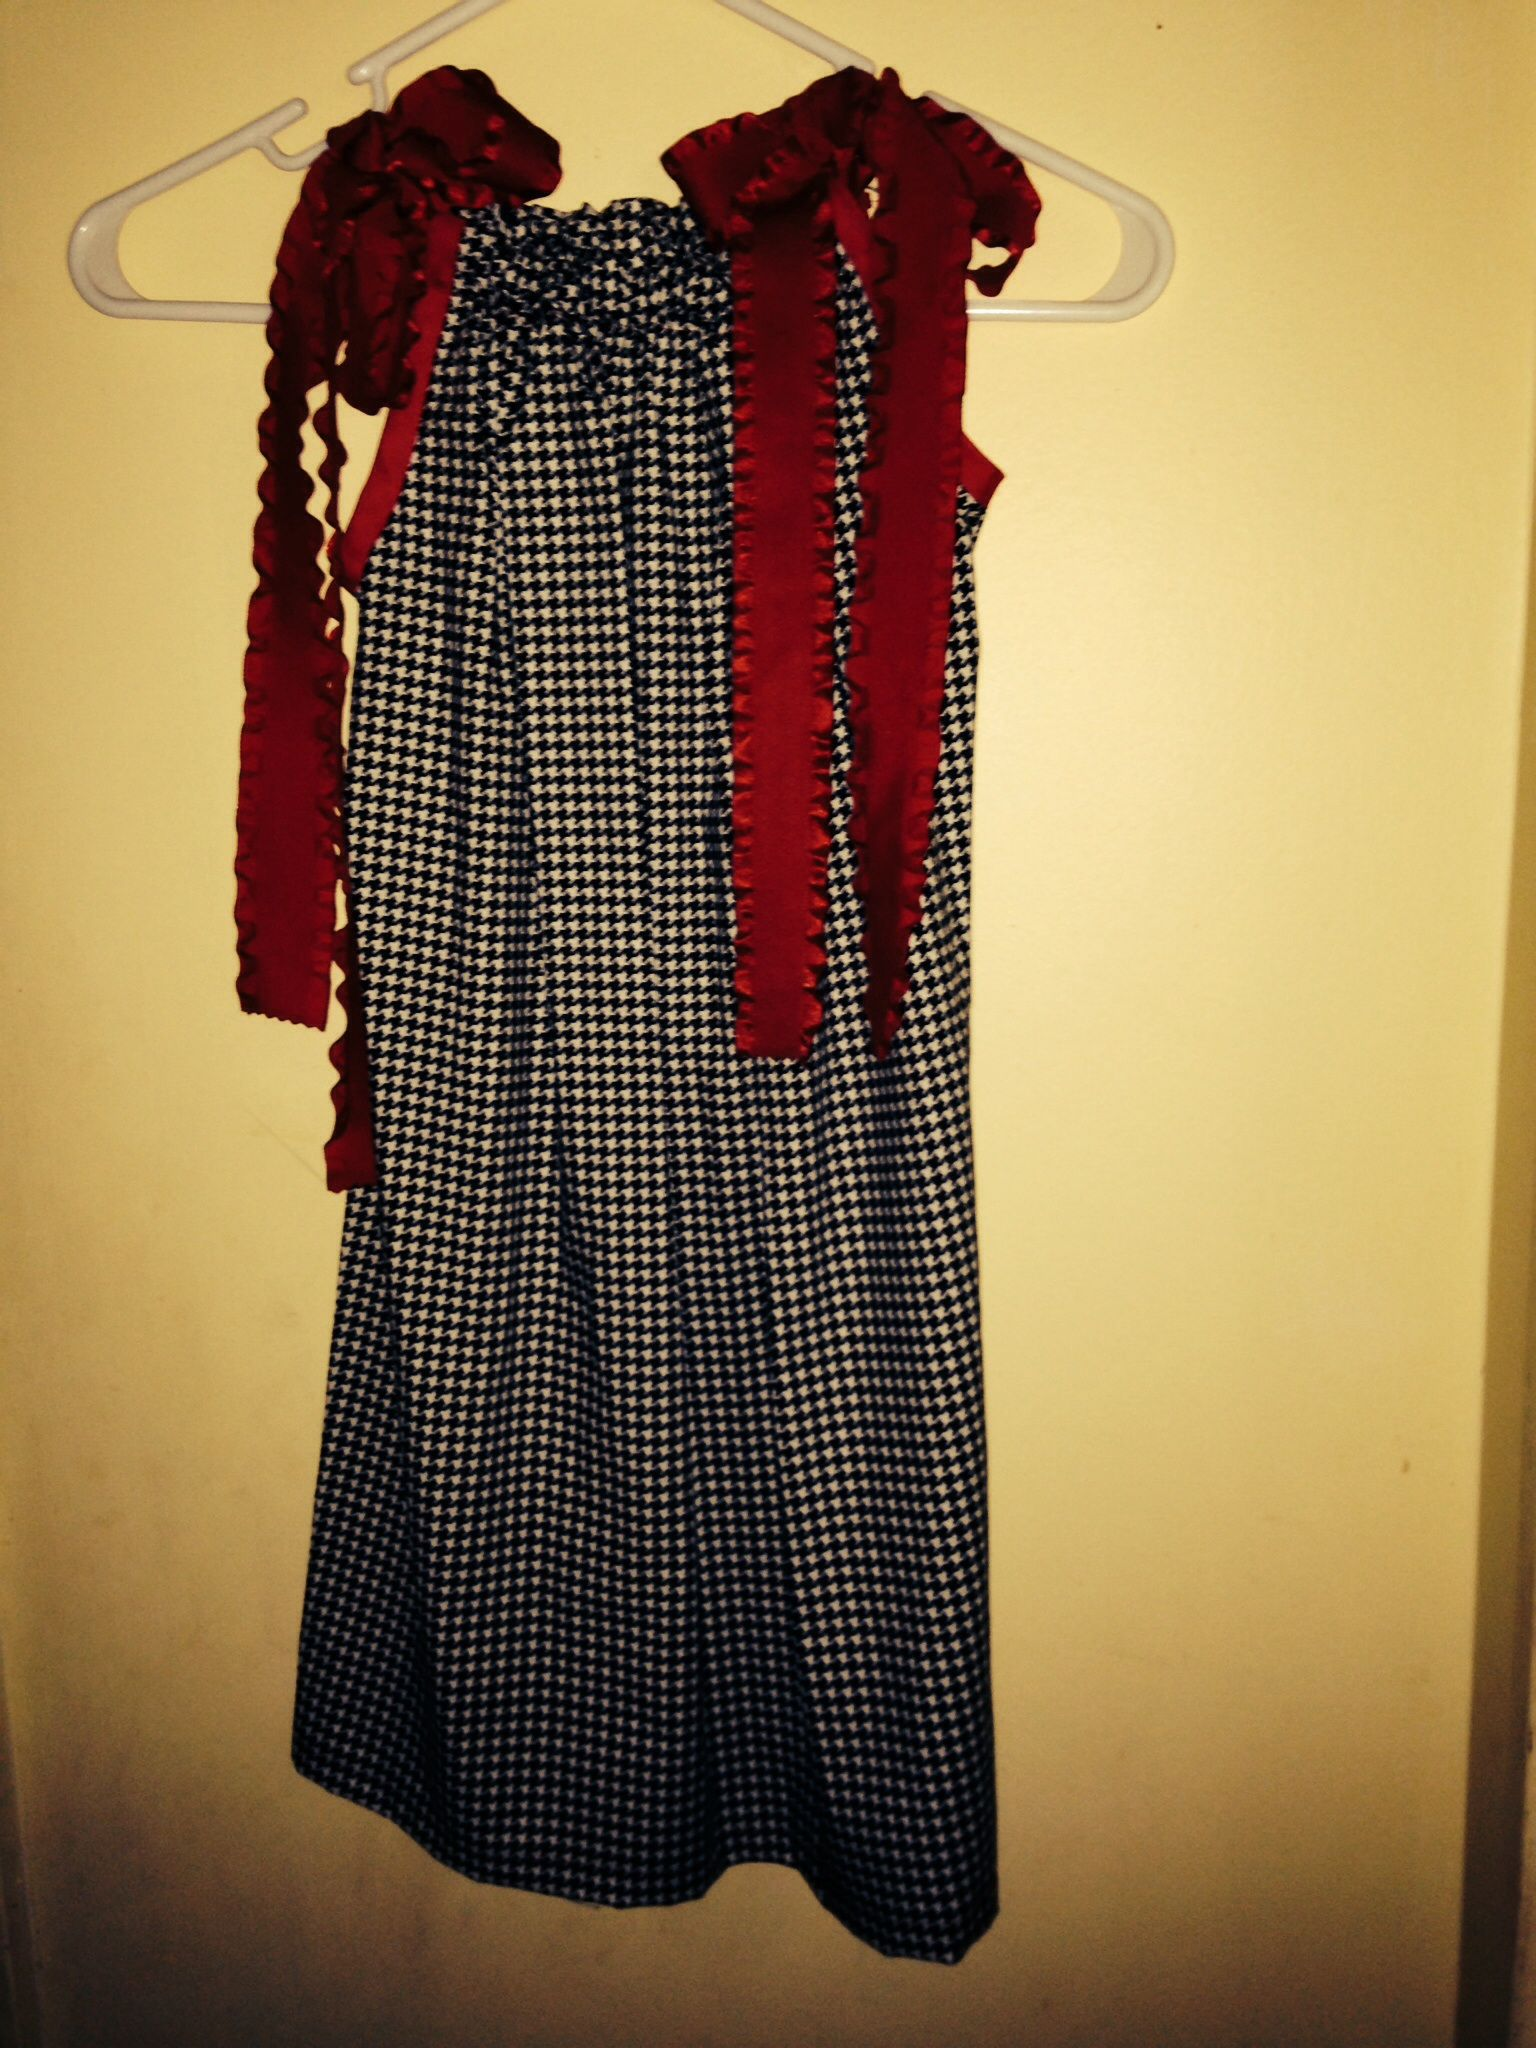 Alabama pillowcase dress, size 5/6. $25